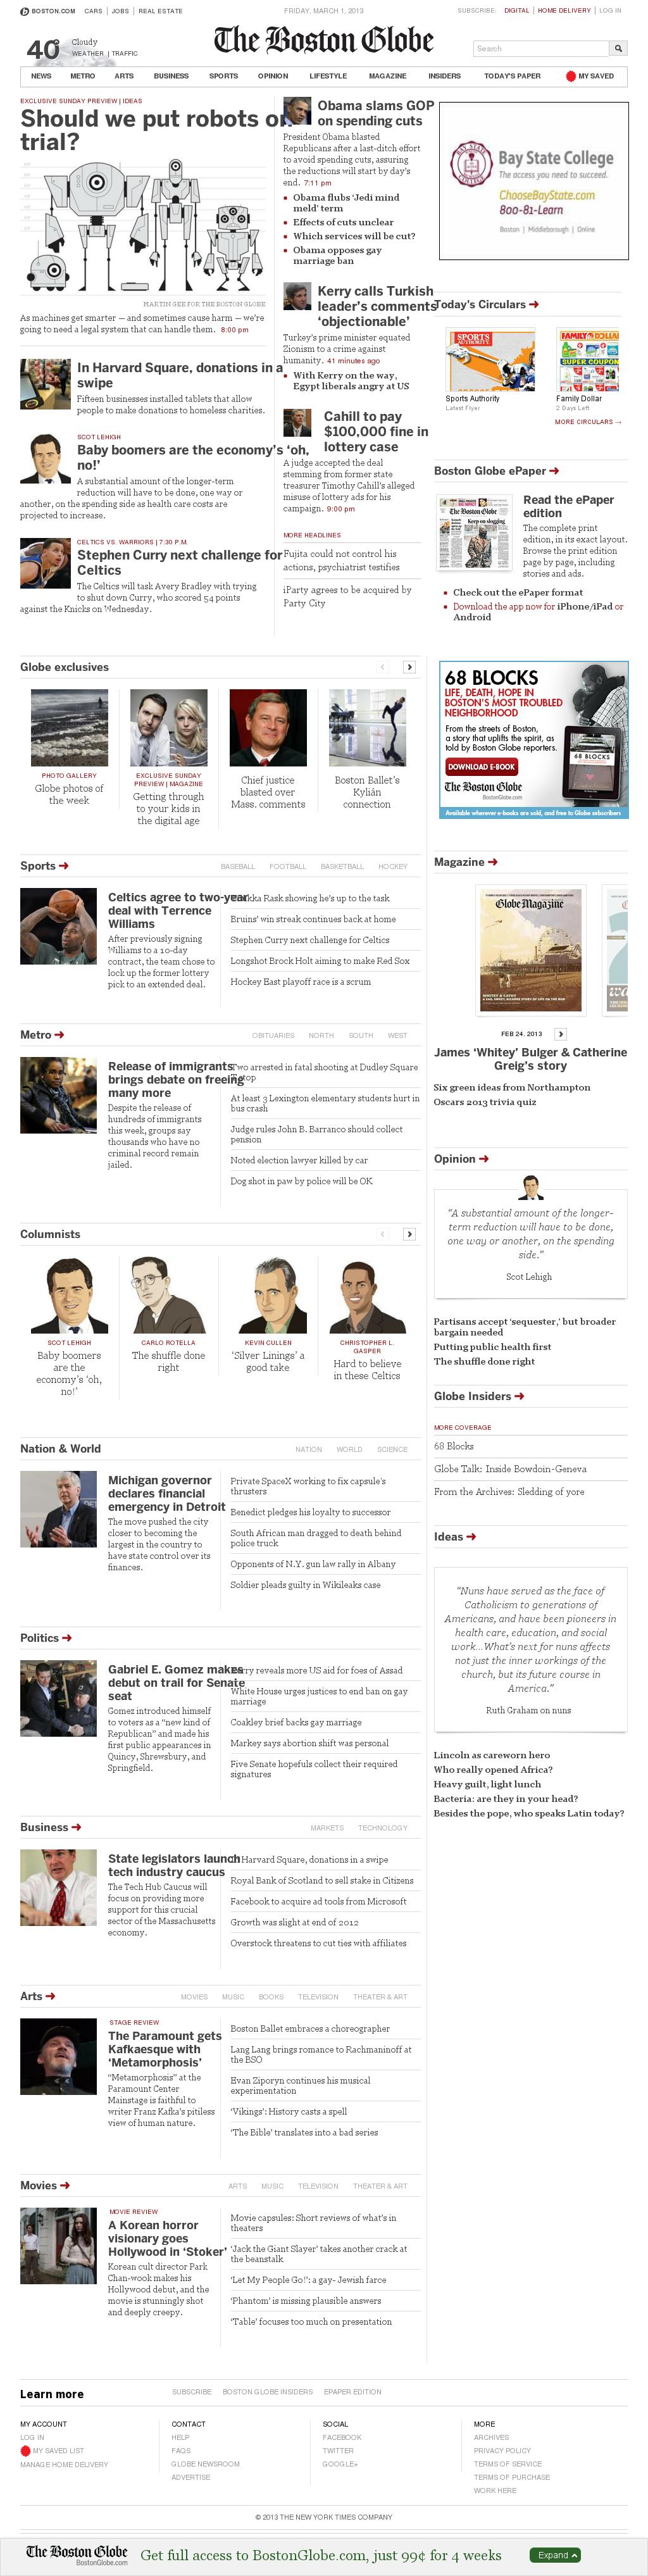 The Boston Globe at Friday March 1, 2013, 10:02 p.m. UTC